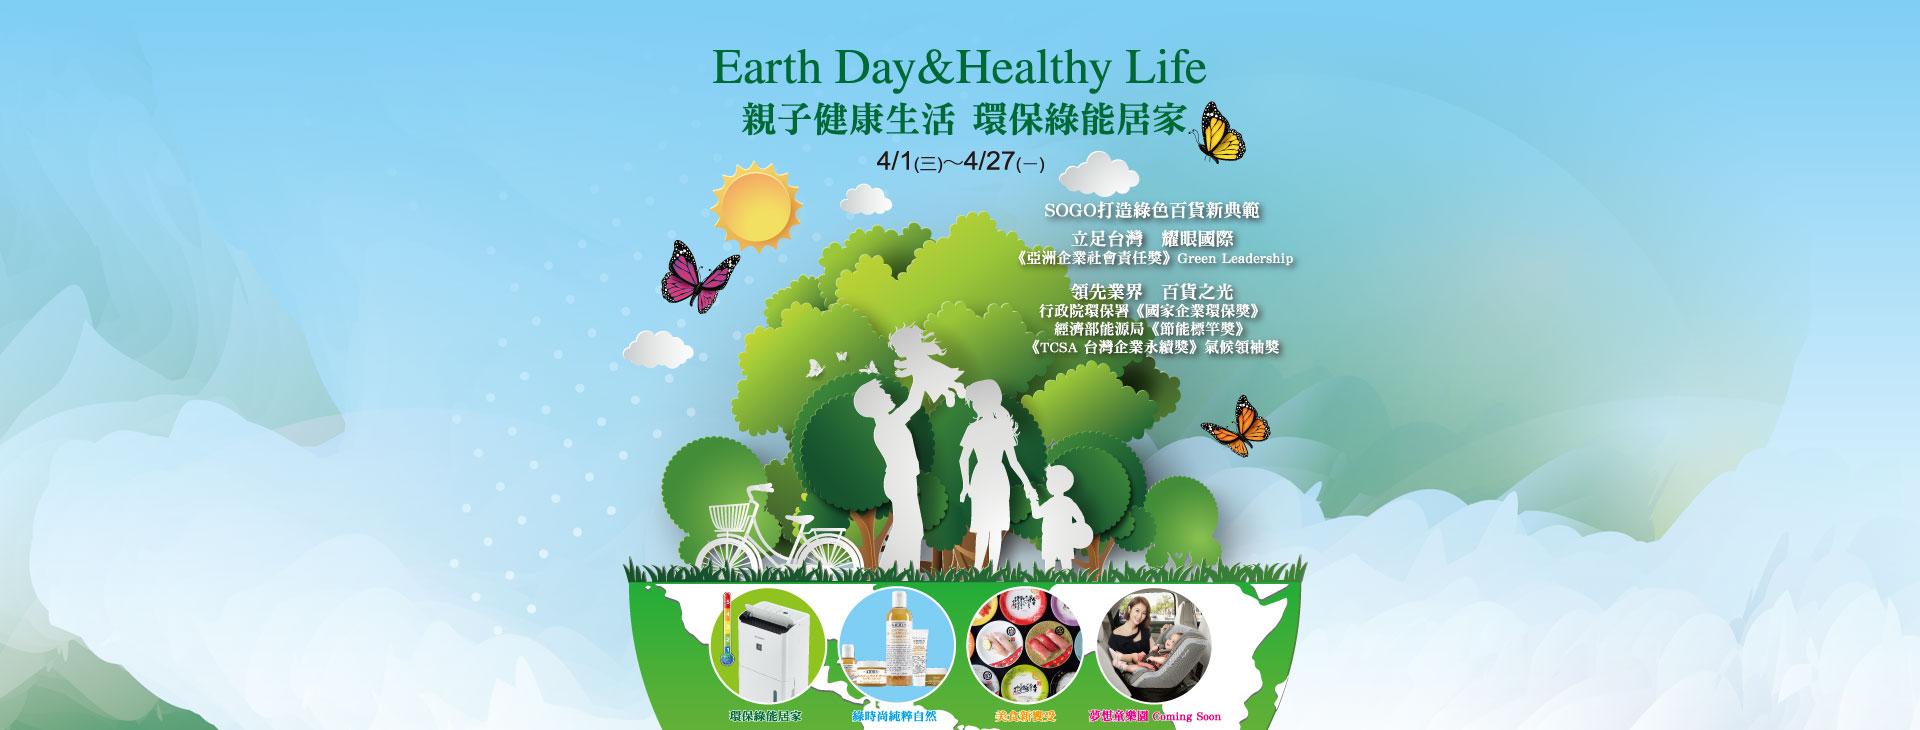 2020 Earth Day&Healthy Life親子健康生活 環保綠能居家